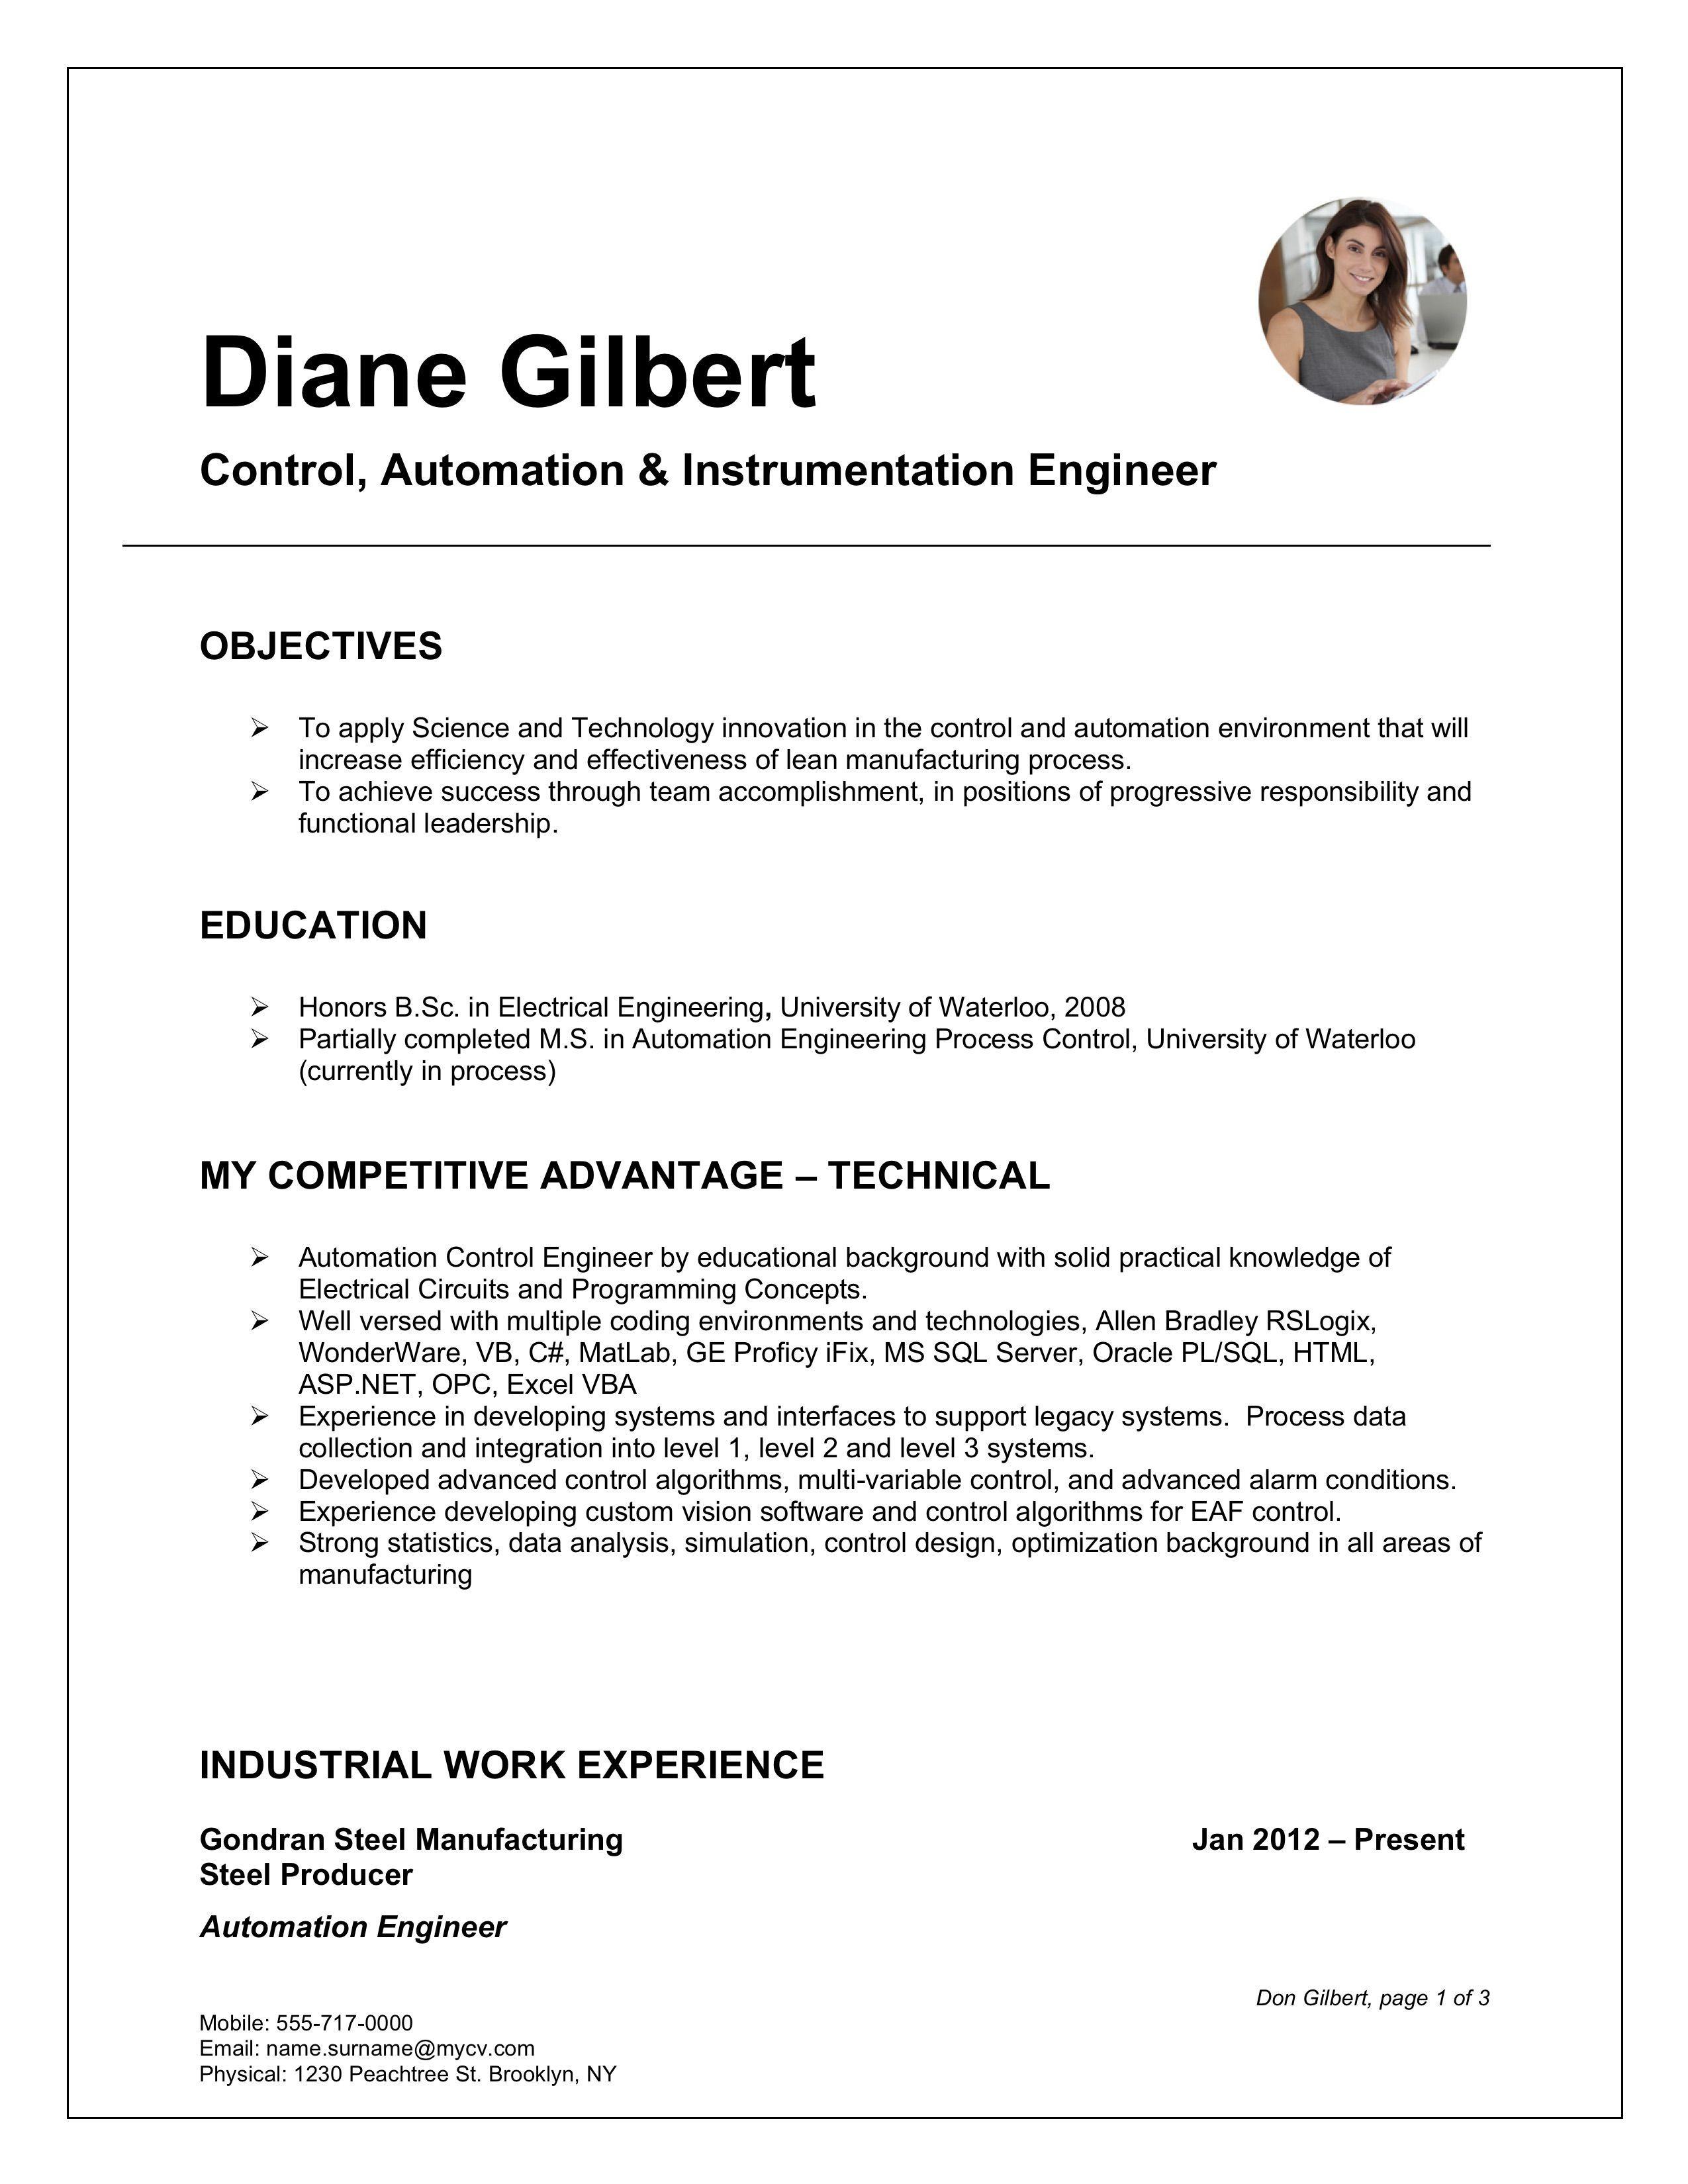 002 Shocking Skill Based Resume Template Word Picture  MicrosoftFull